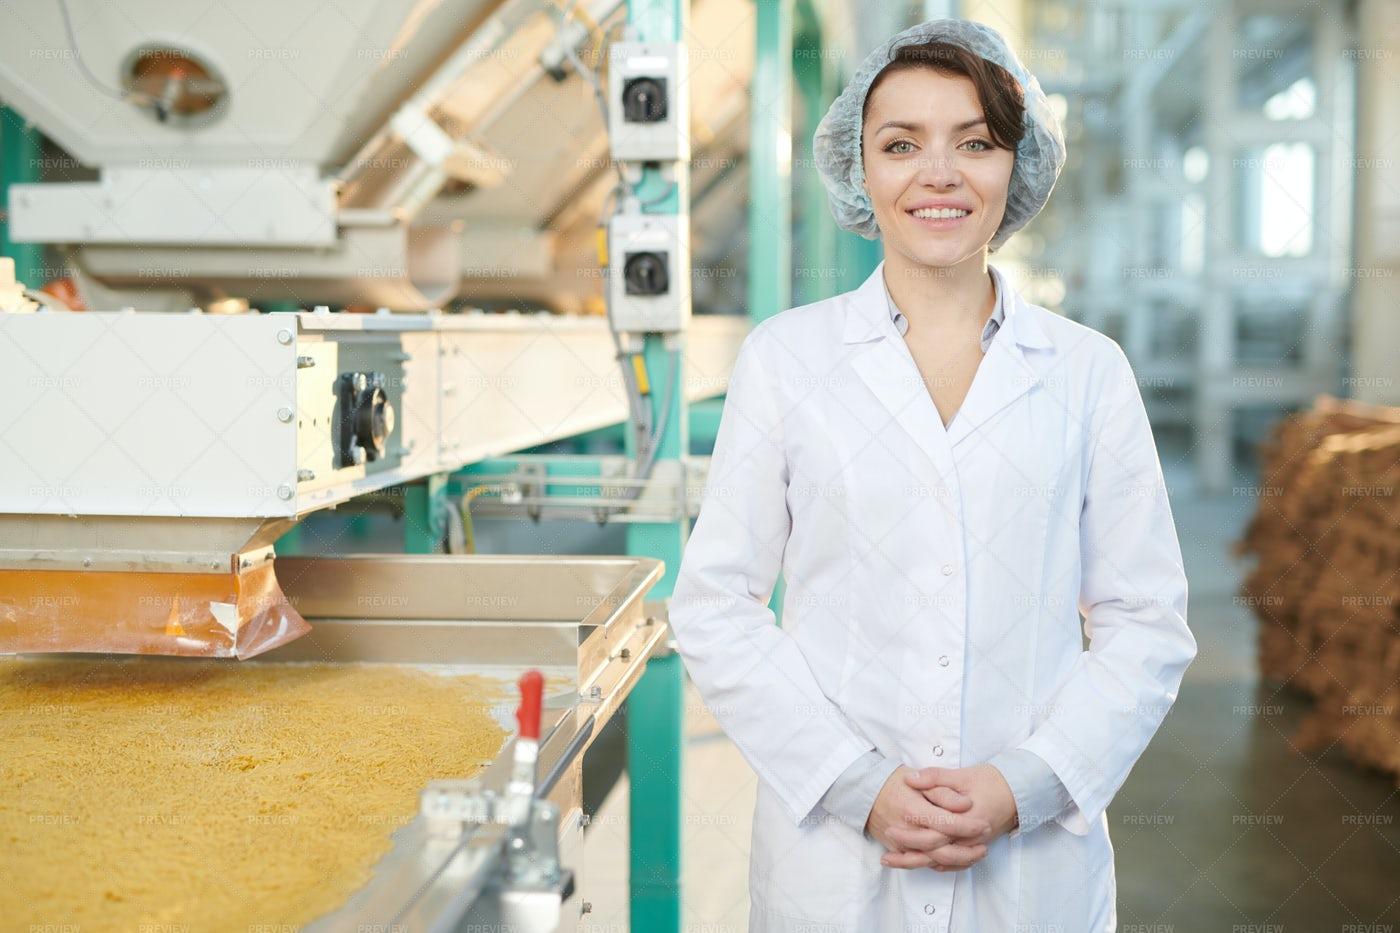 Smiling Woman At Food Factory: Stock Photos